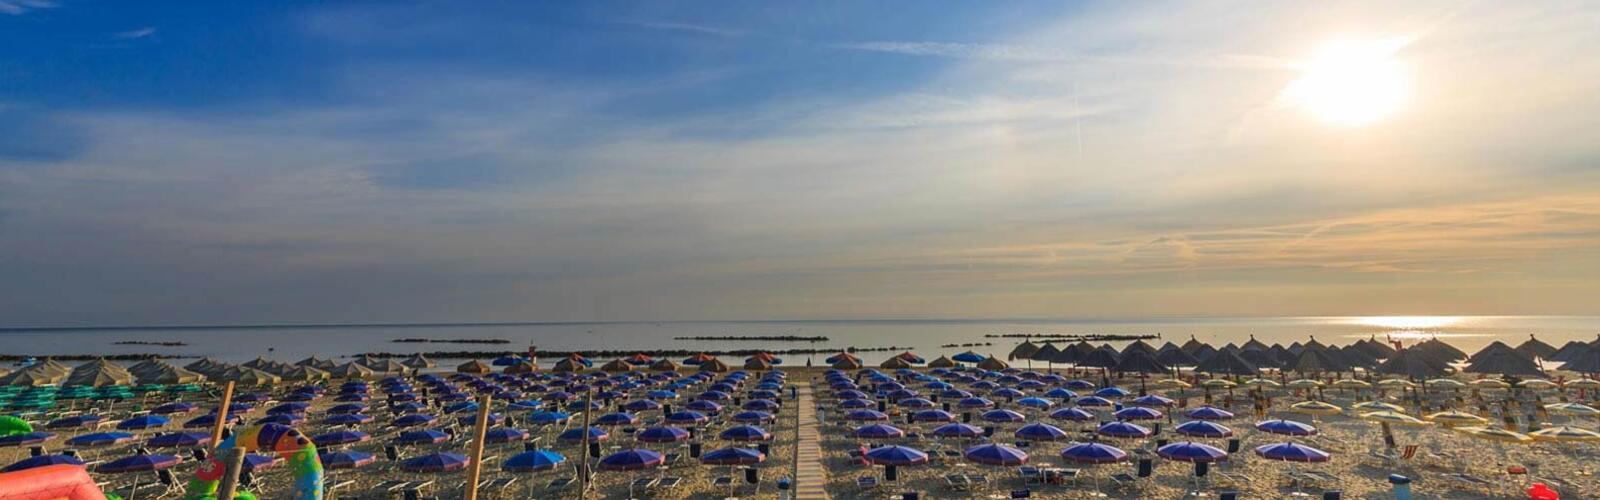 hotellaninfea en beach 003